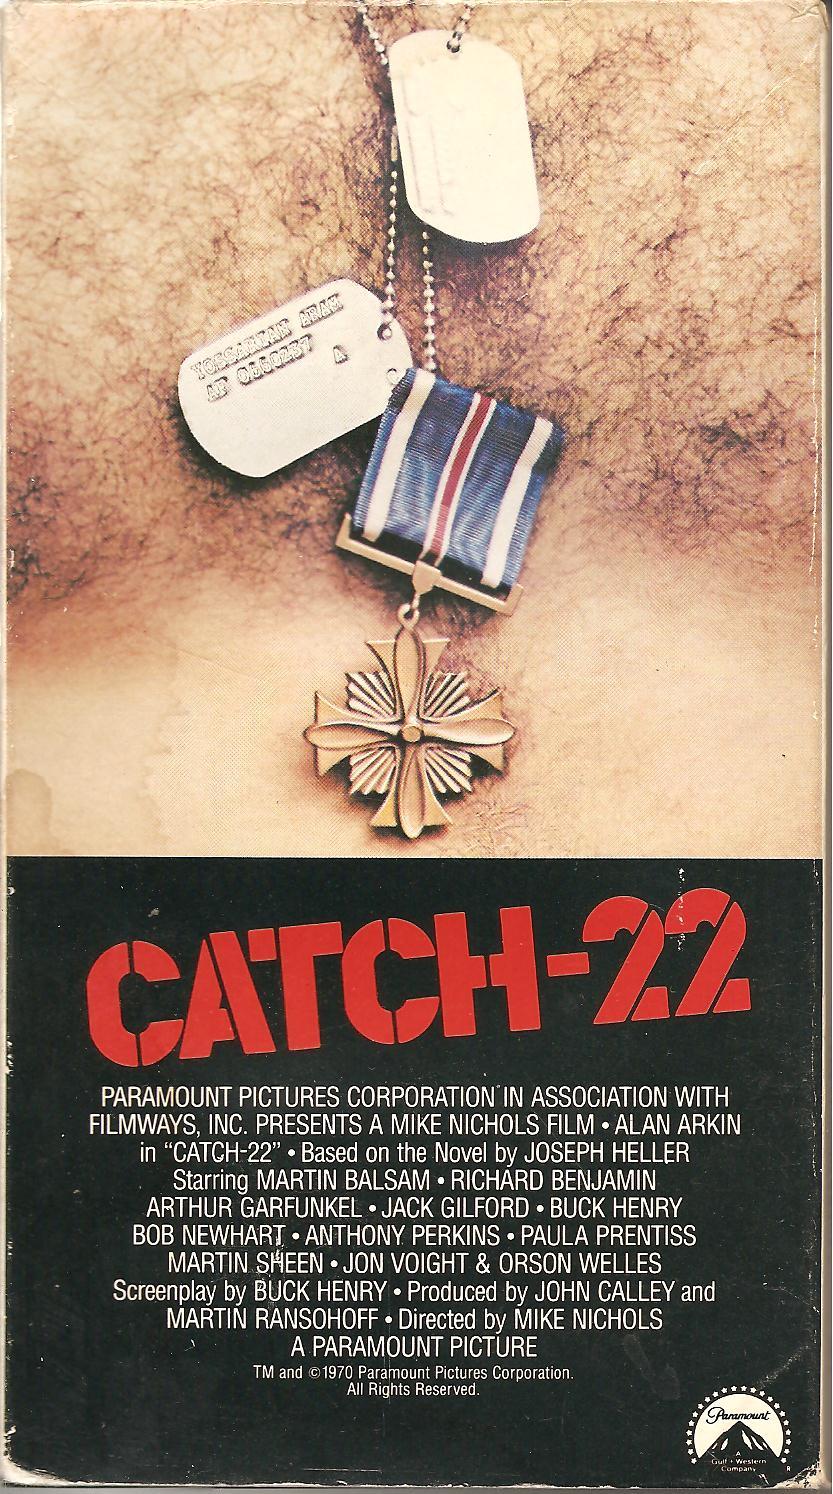 Catch 22 Film